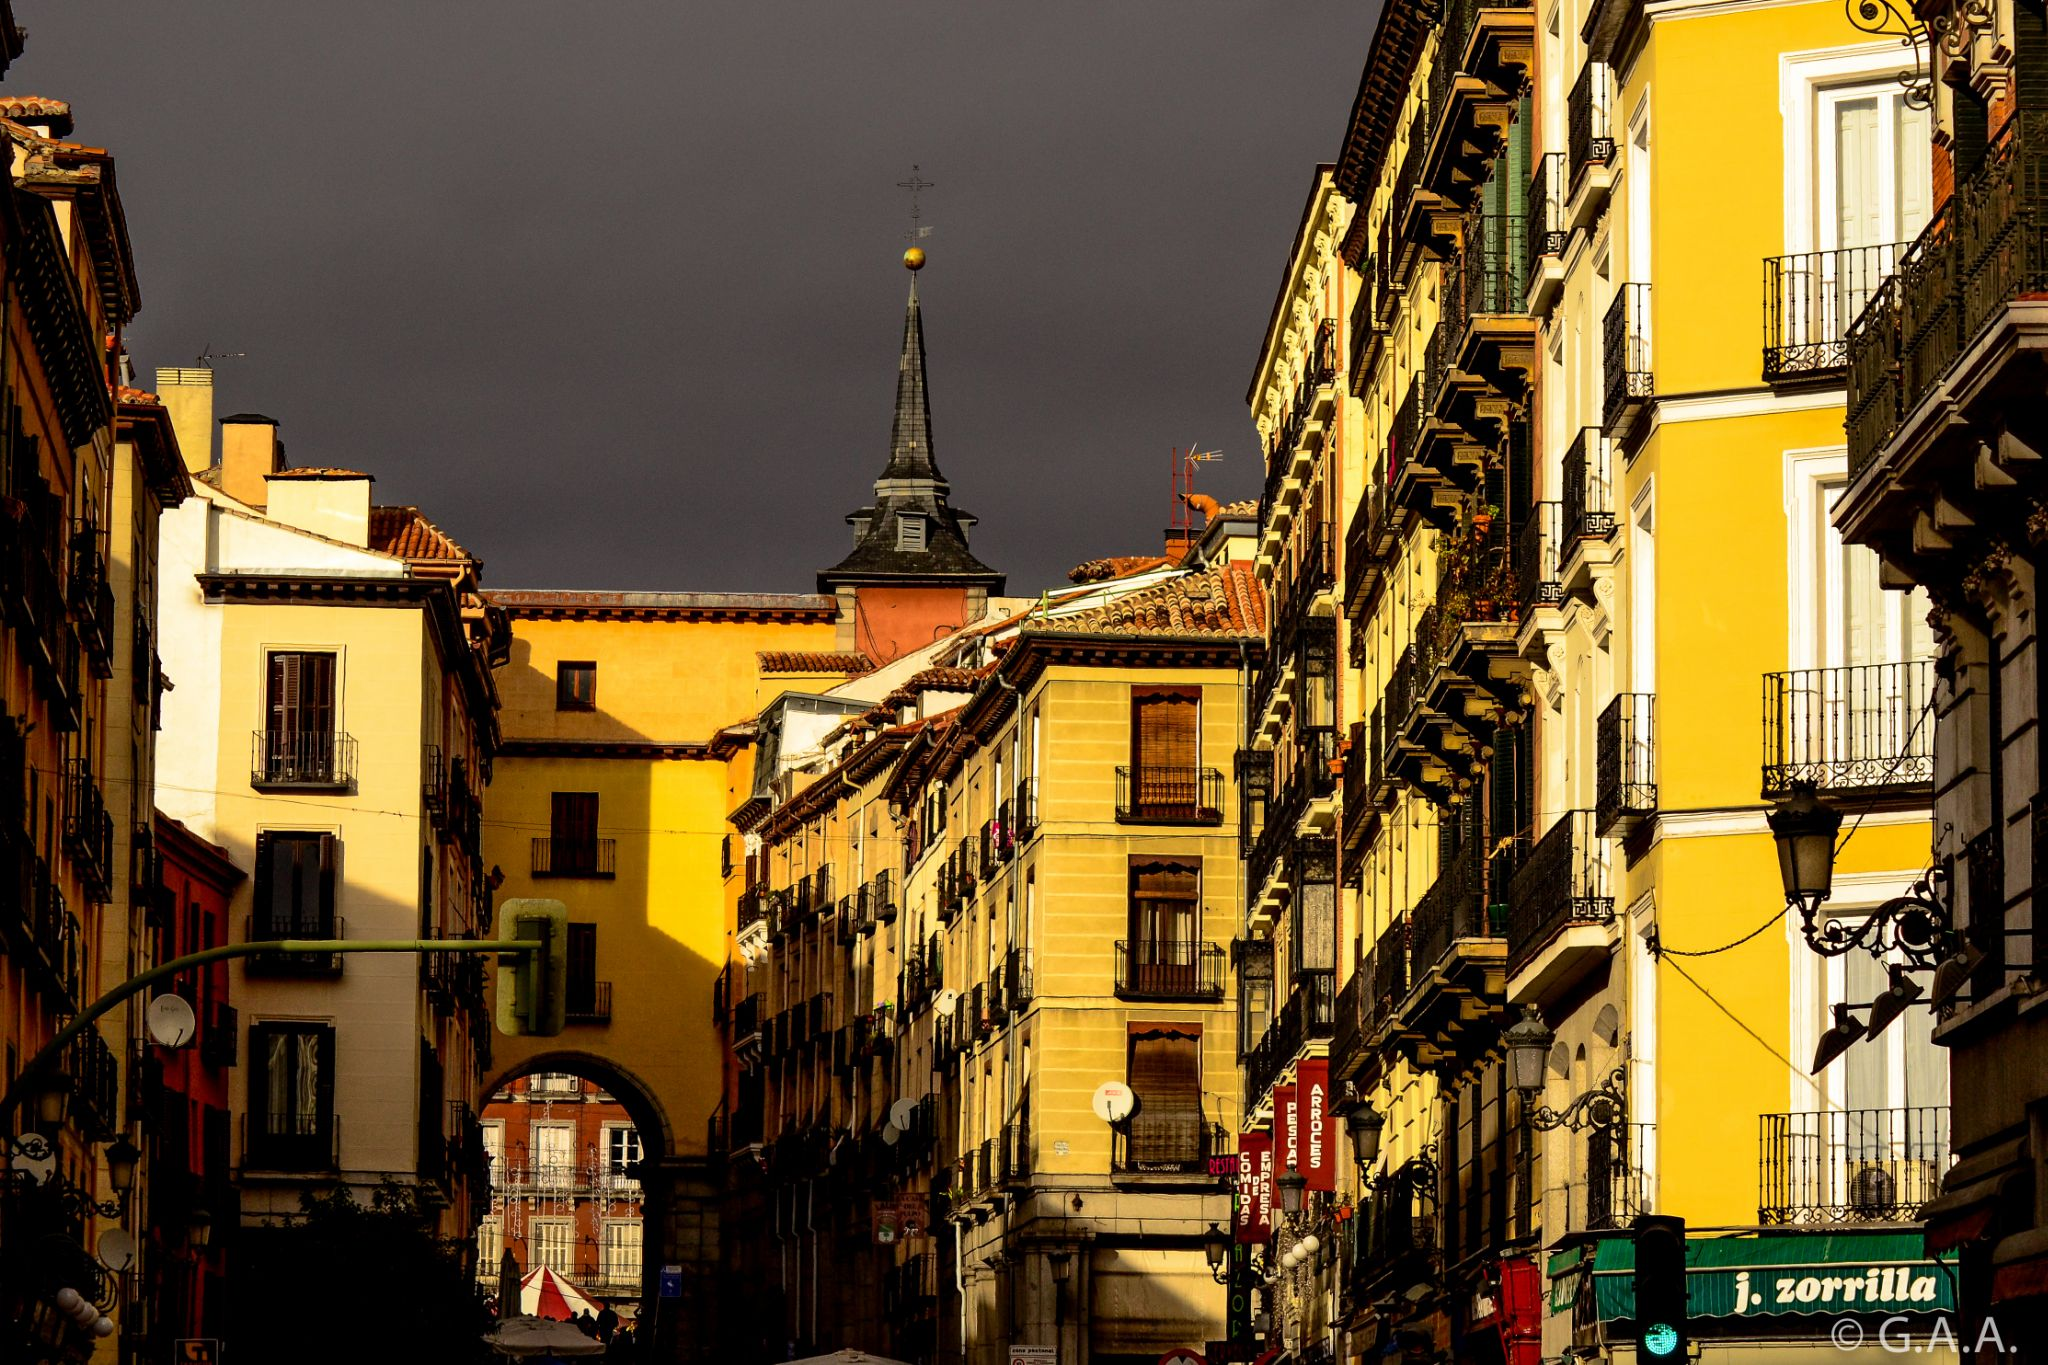 Weather in Madrid by Gabriel Abaurre Amaral